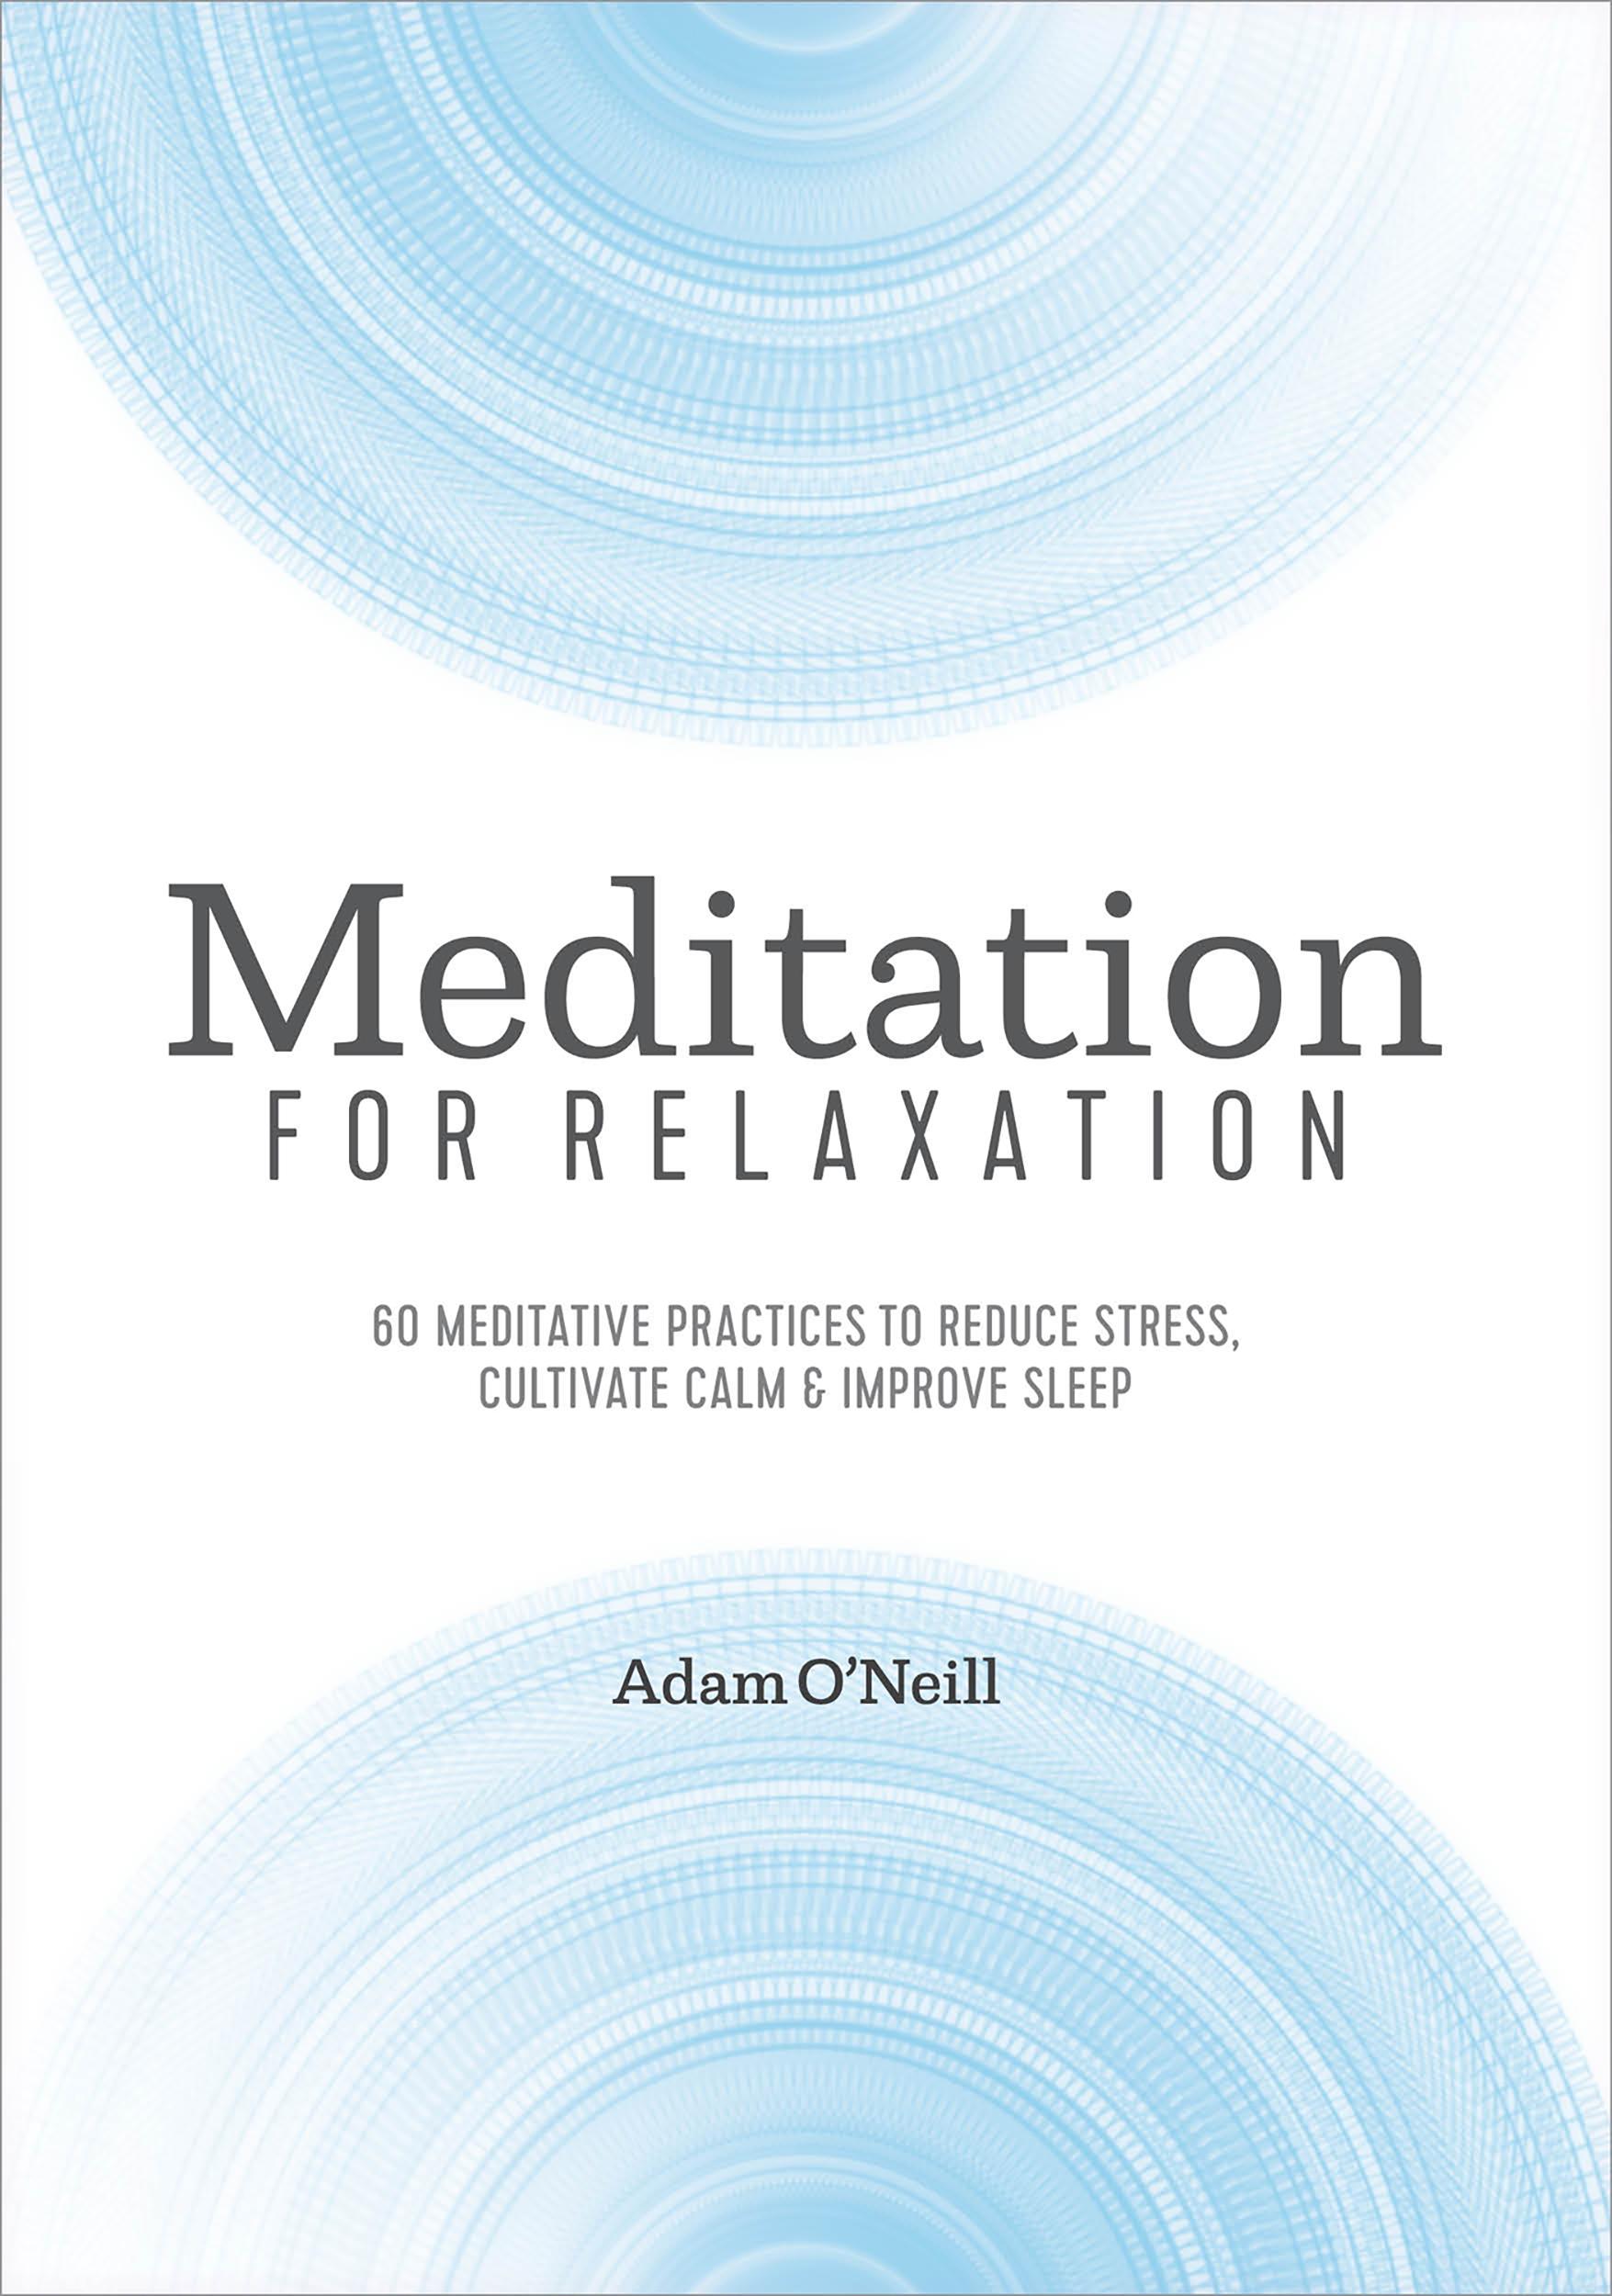 MeditationForRelaxation_9781641523127_AppleAmazon.jpg